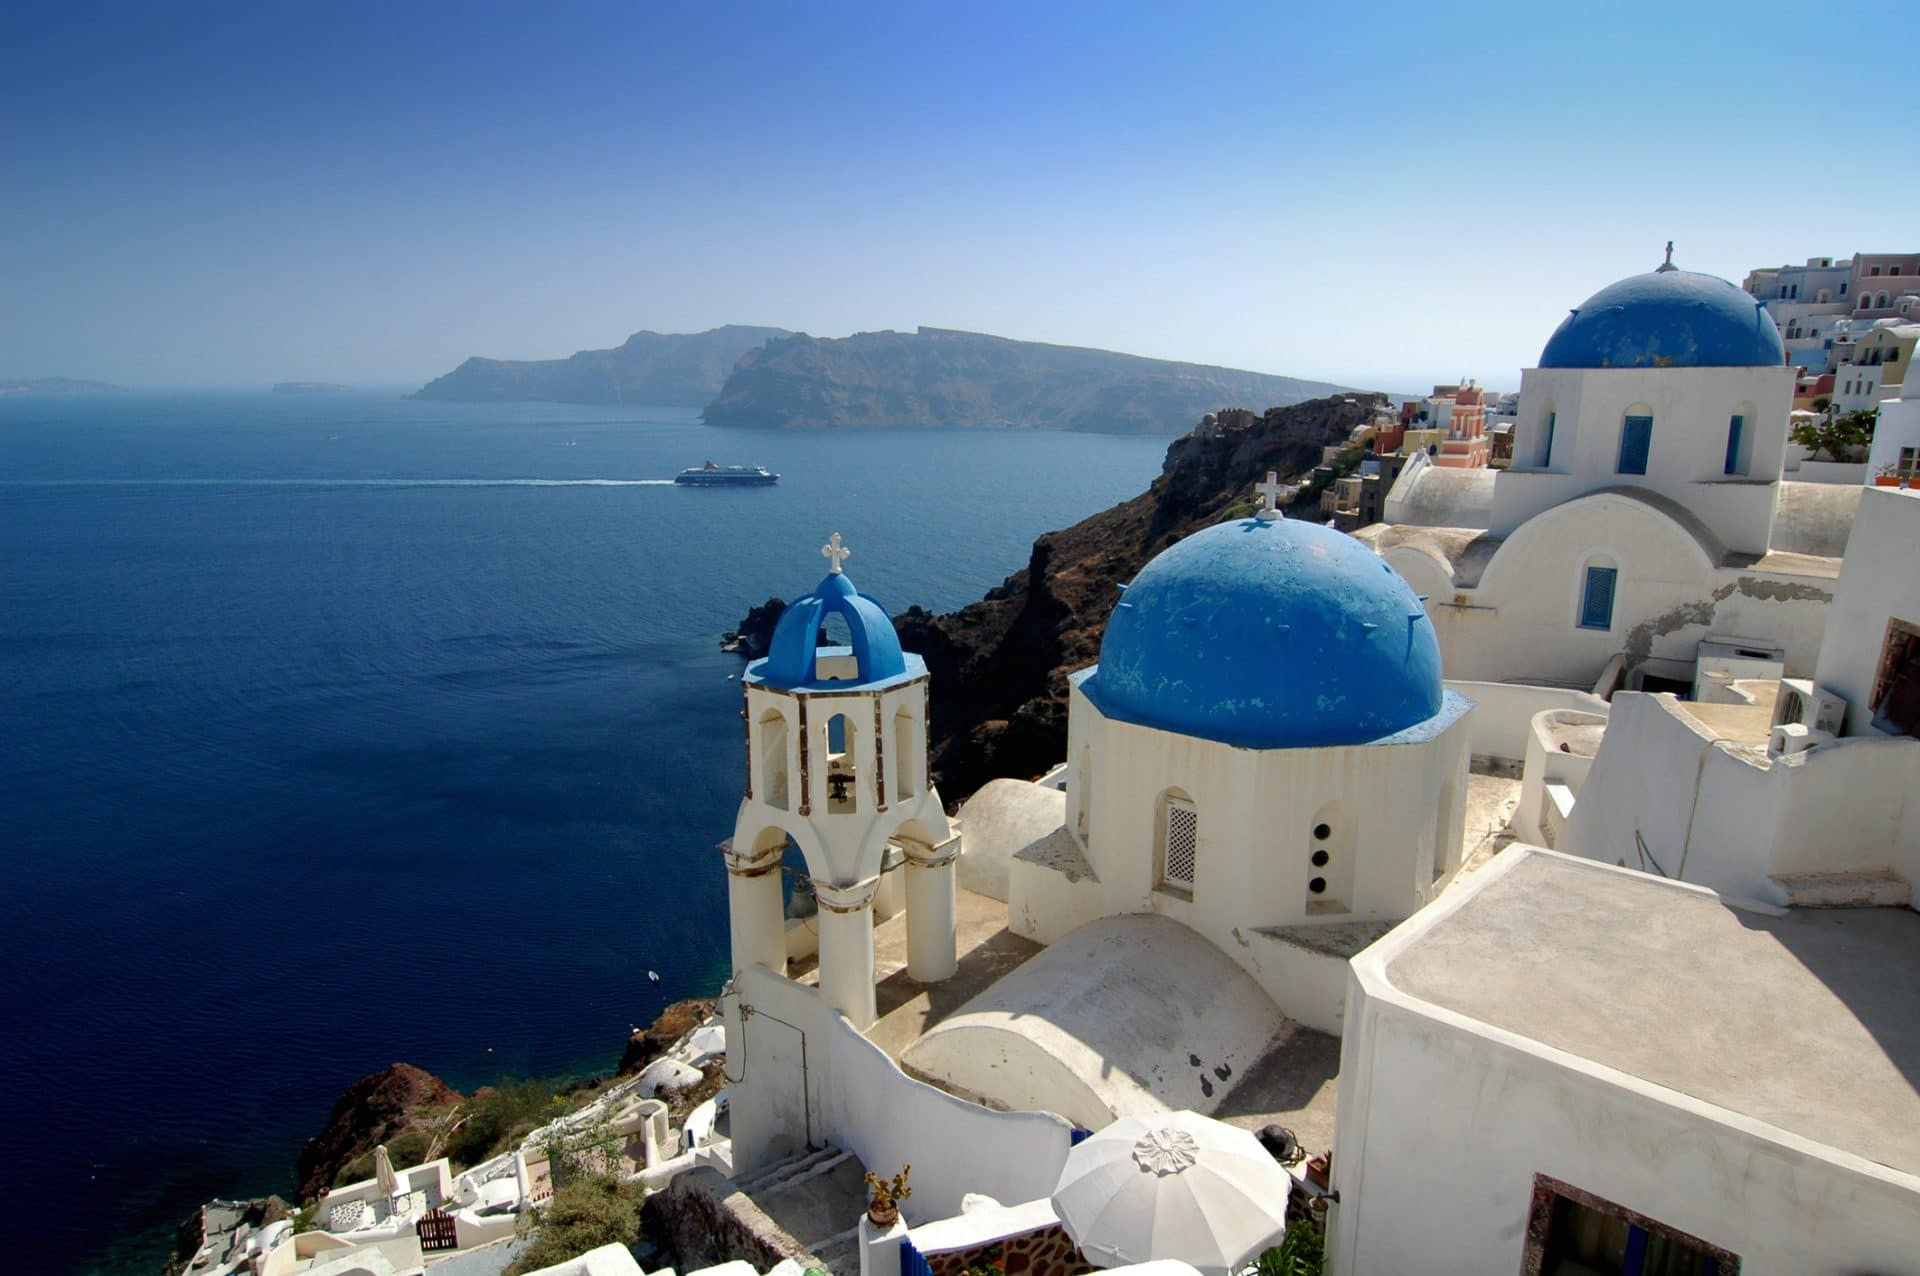 Santorini's amazing views